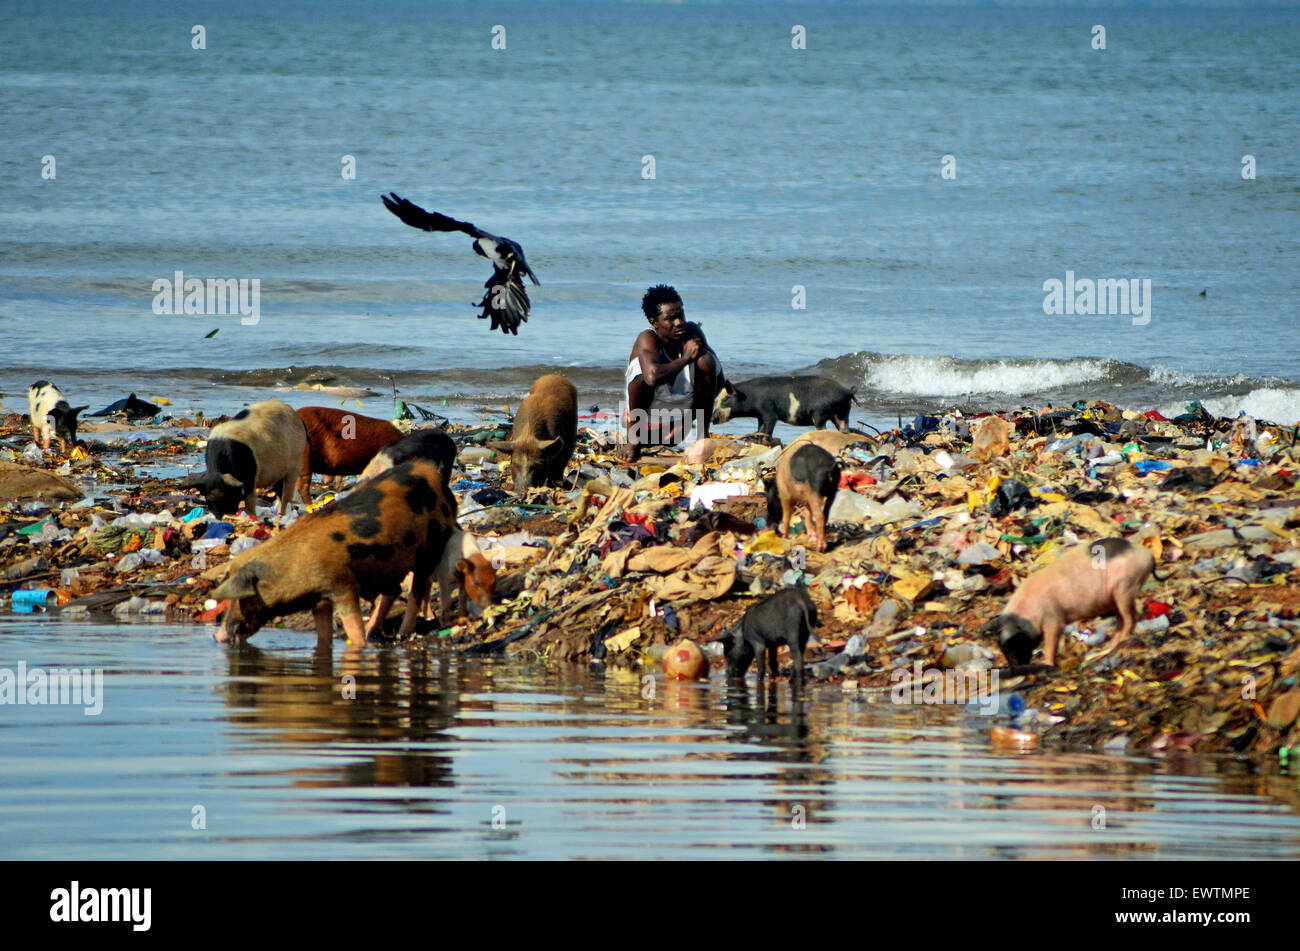 Kroo Bay, Sierra Leone, during an outbreak of cholera in 2012. - Stock Image